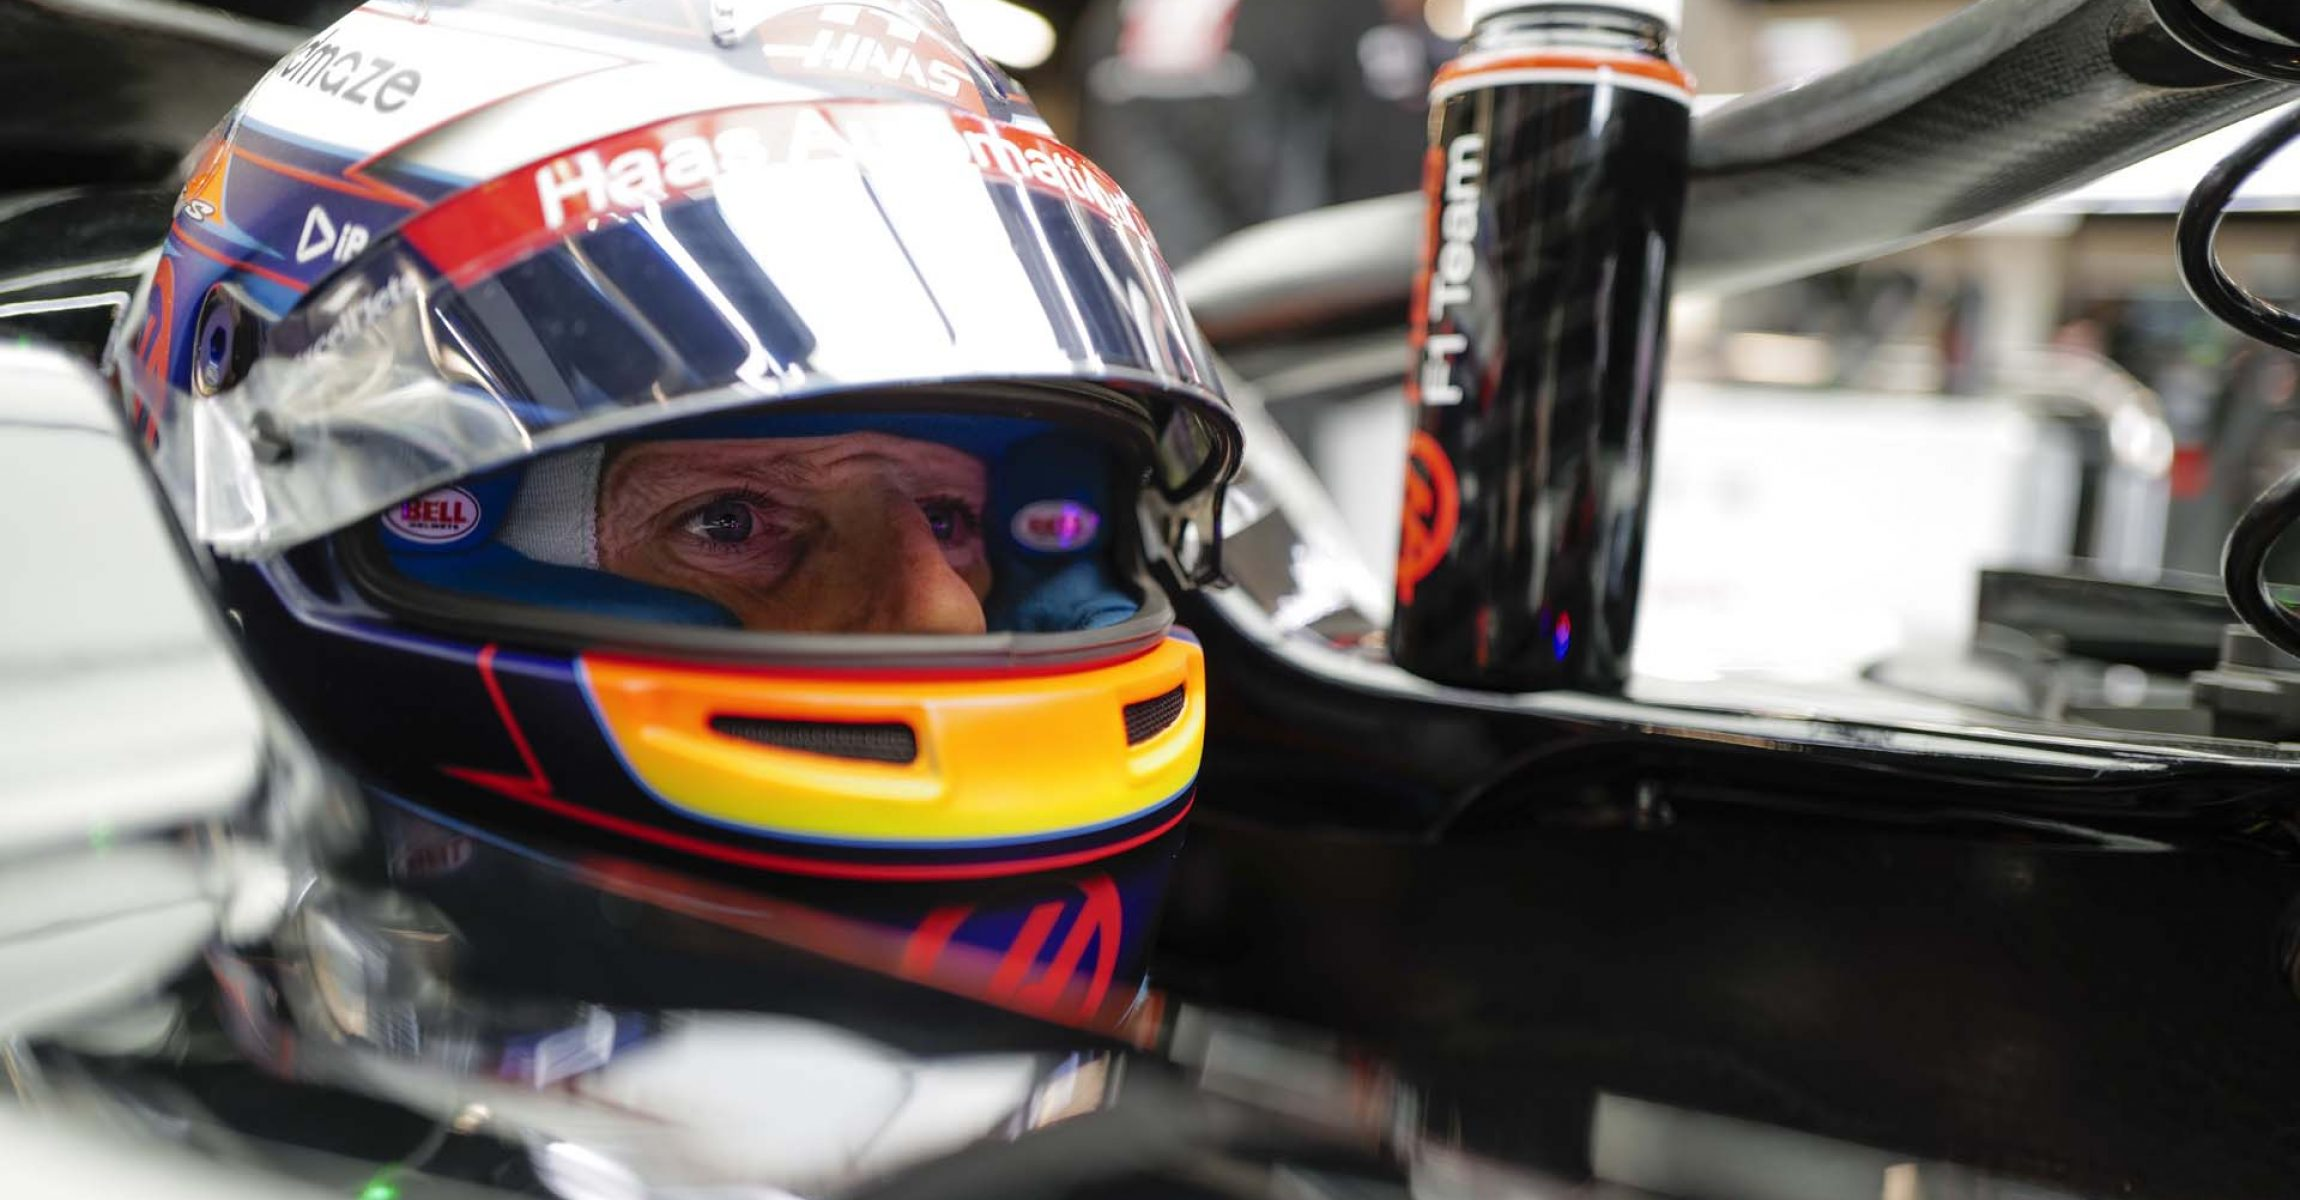 CIRCUIT DE BARCELONA-CATALUNYA, SPAIN - FEBRUARY 26: Romain Grosjean, Haas VF-20 sits in his car in the garage during the Barcelona February testing II at Circuit de Barcelona-Catalunya on February 26, 2020 in Circuit de Barcelona-Catalunya, Spain.